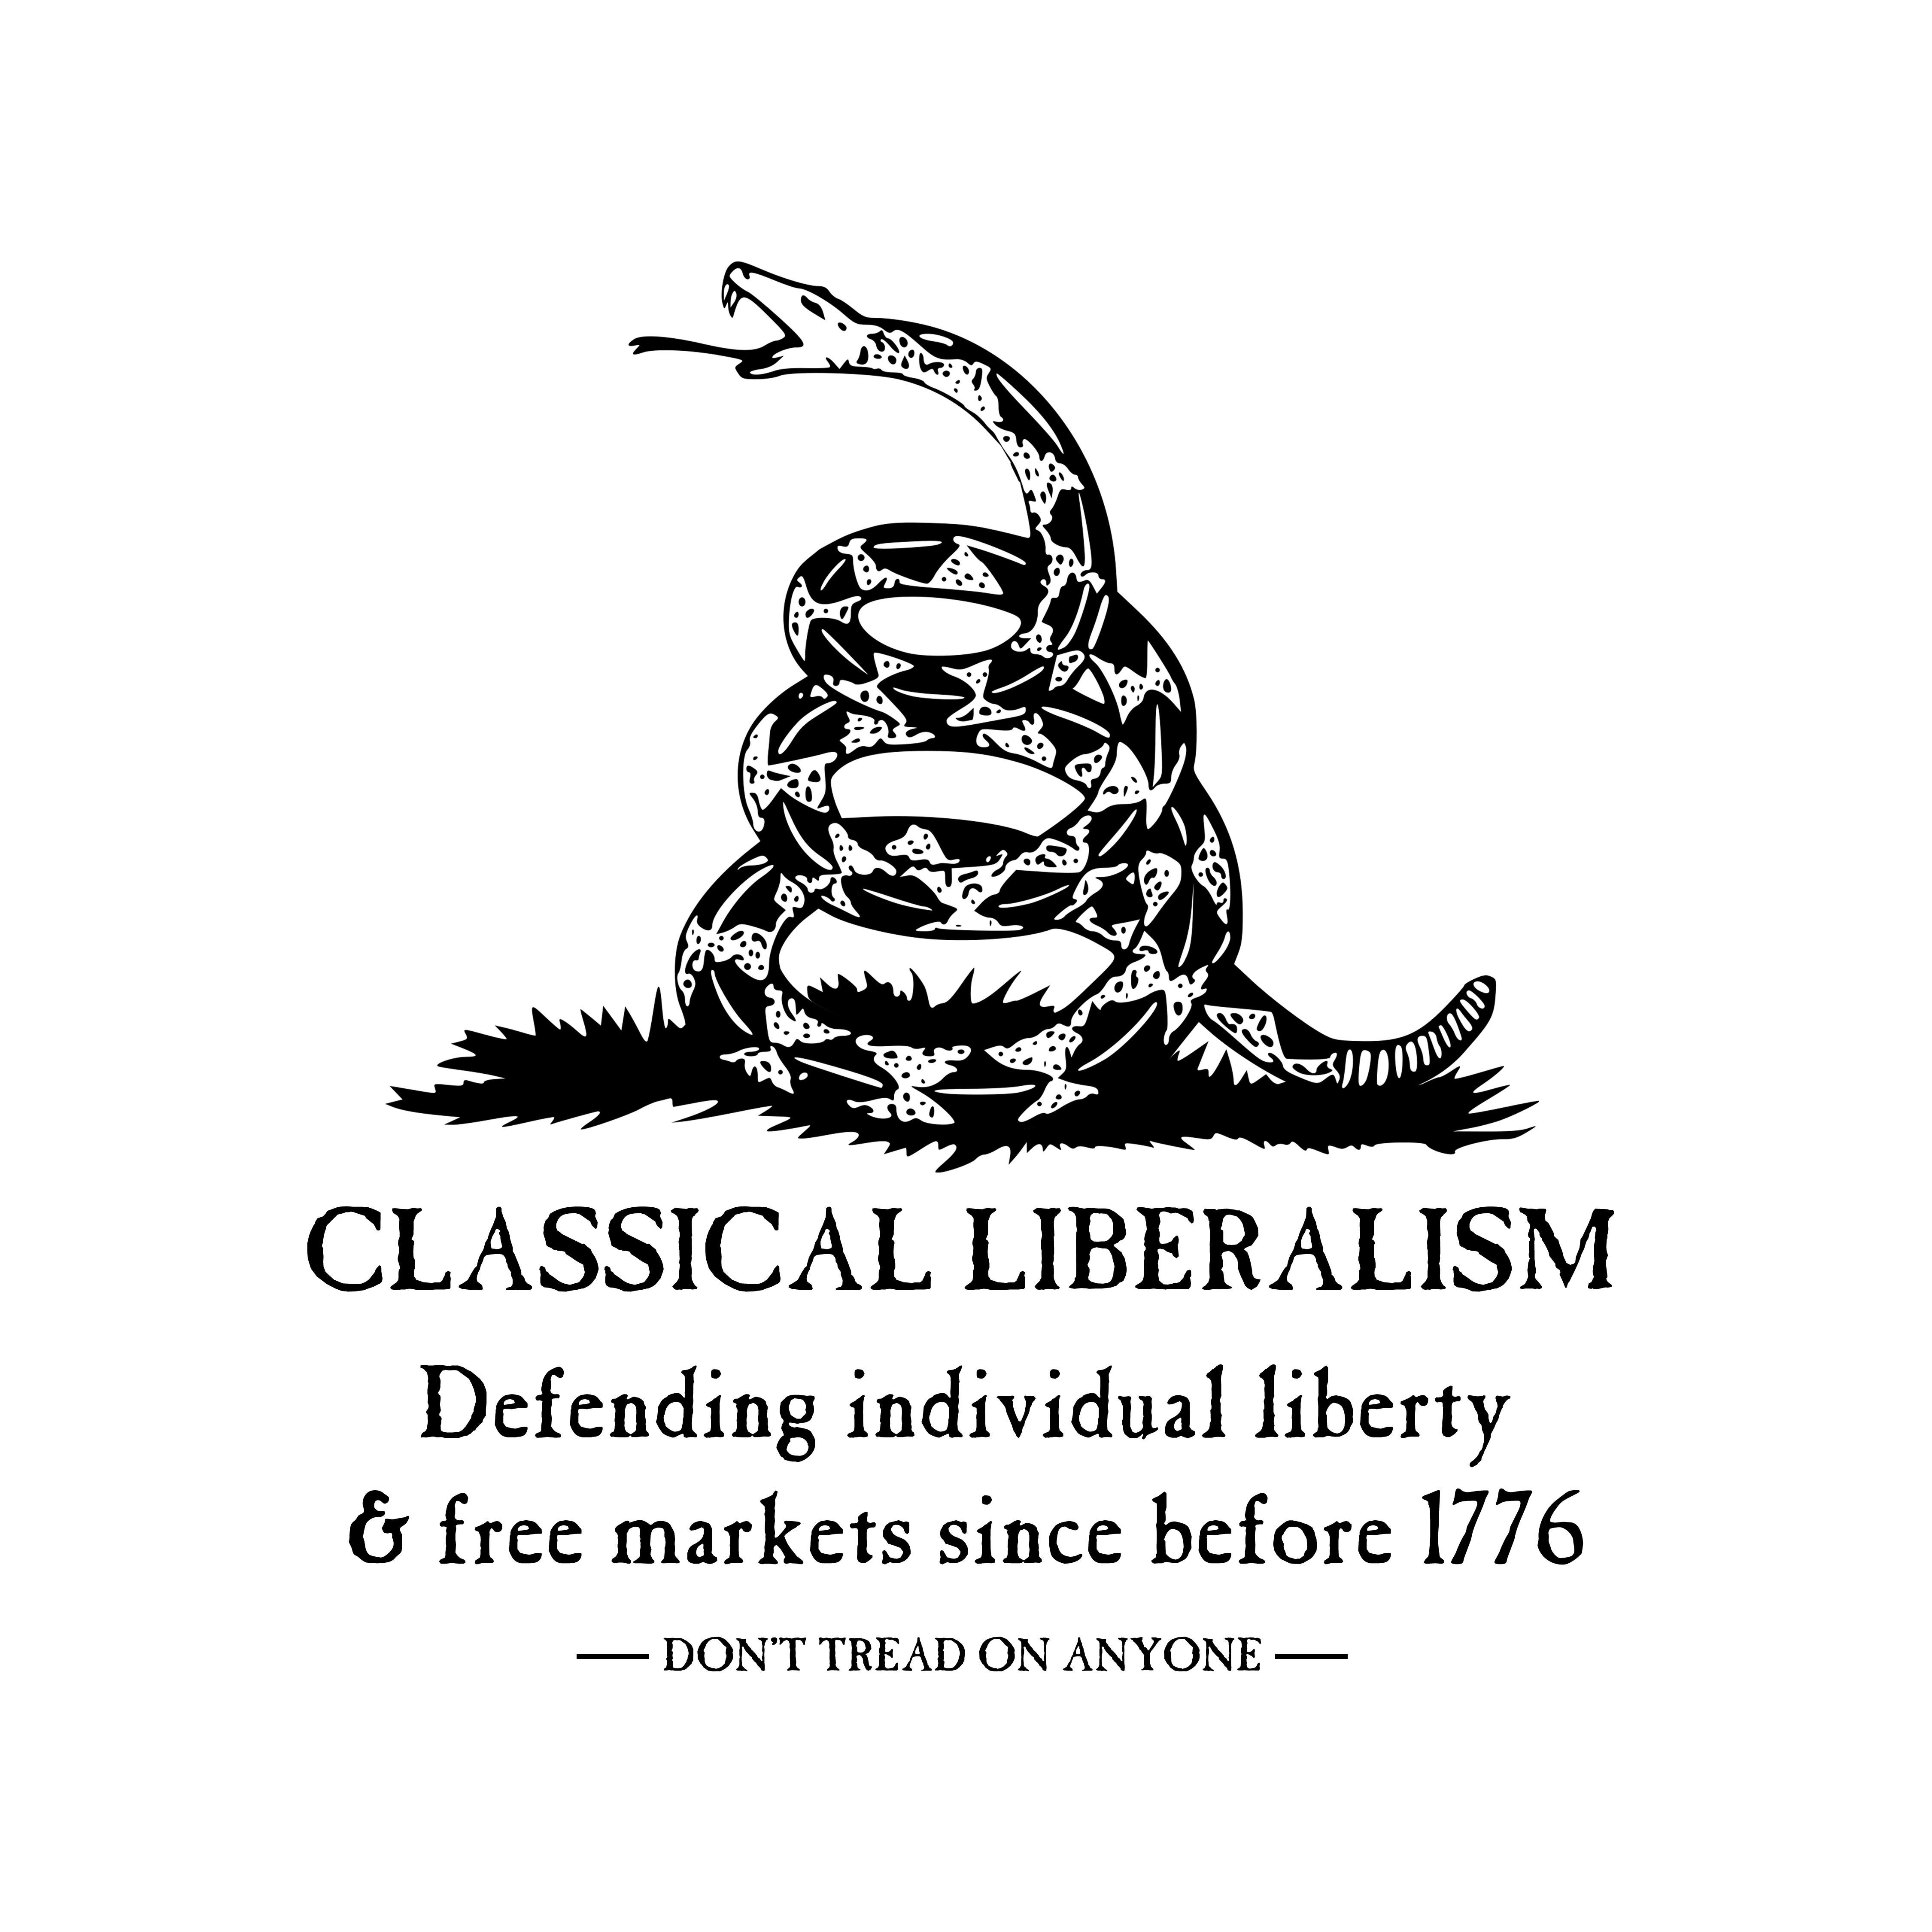 classical liberalism dont tread on anyone libertarian tshirt